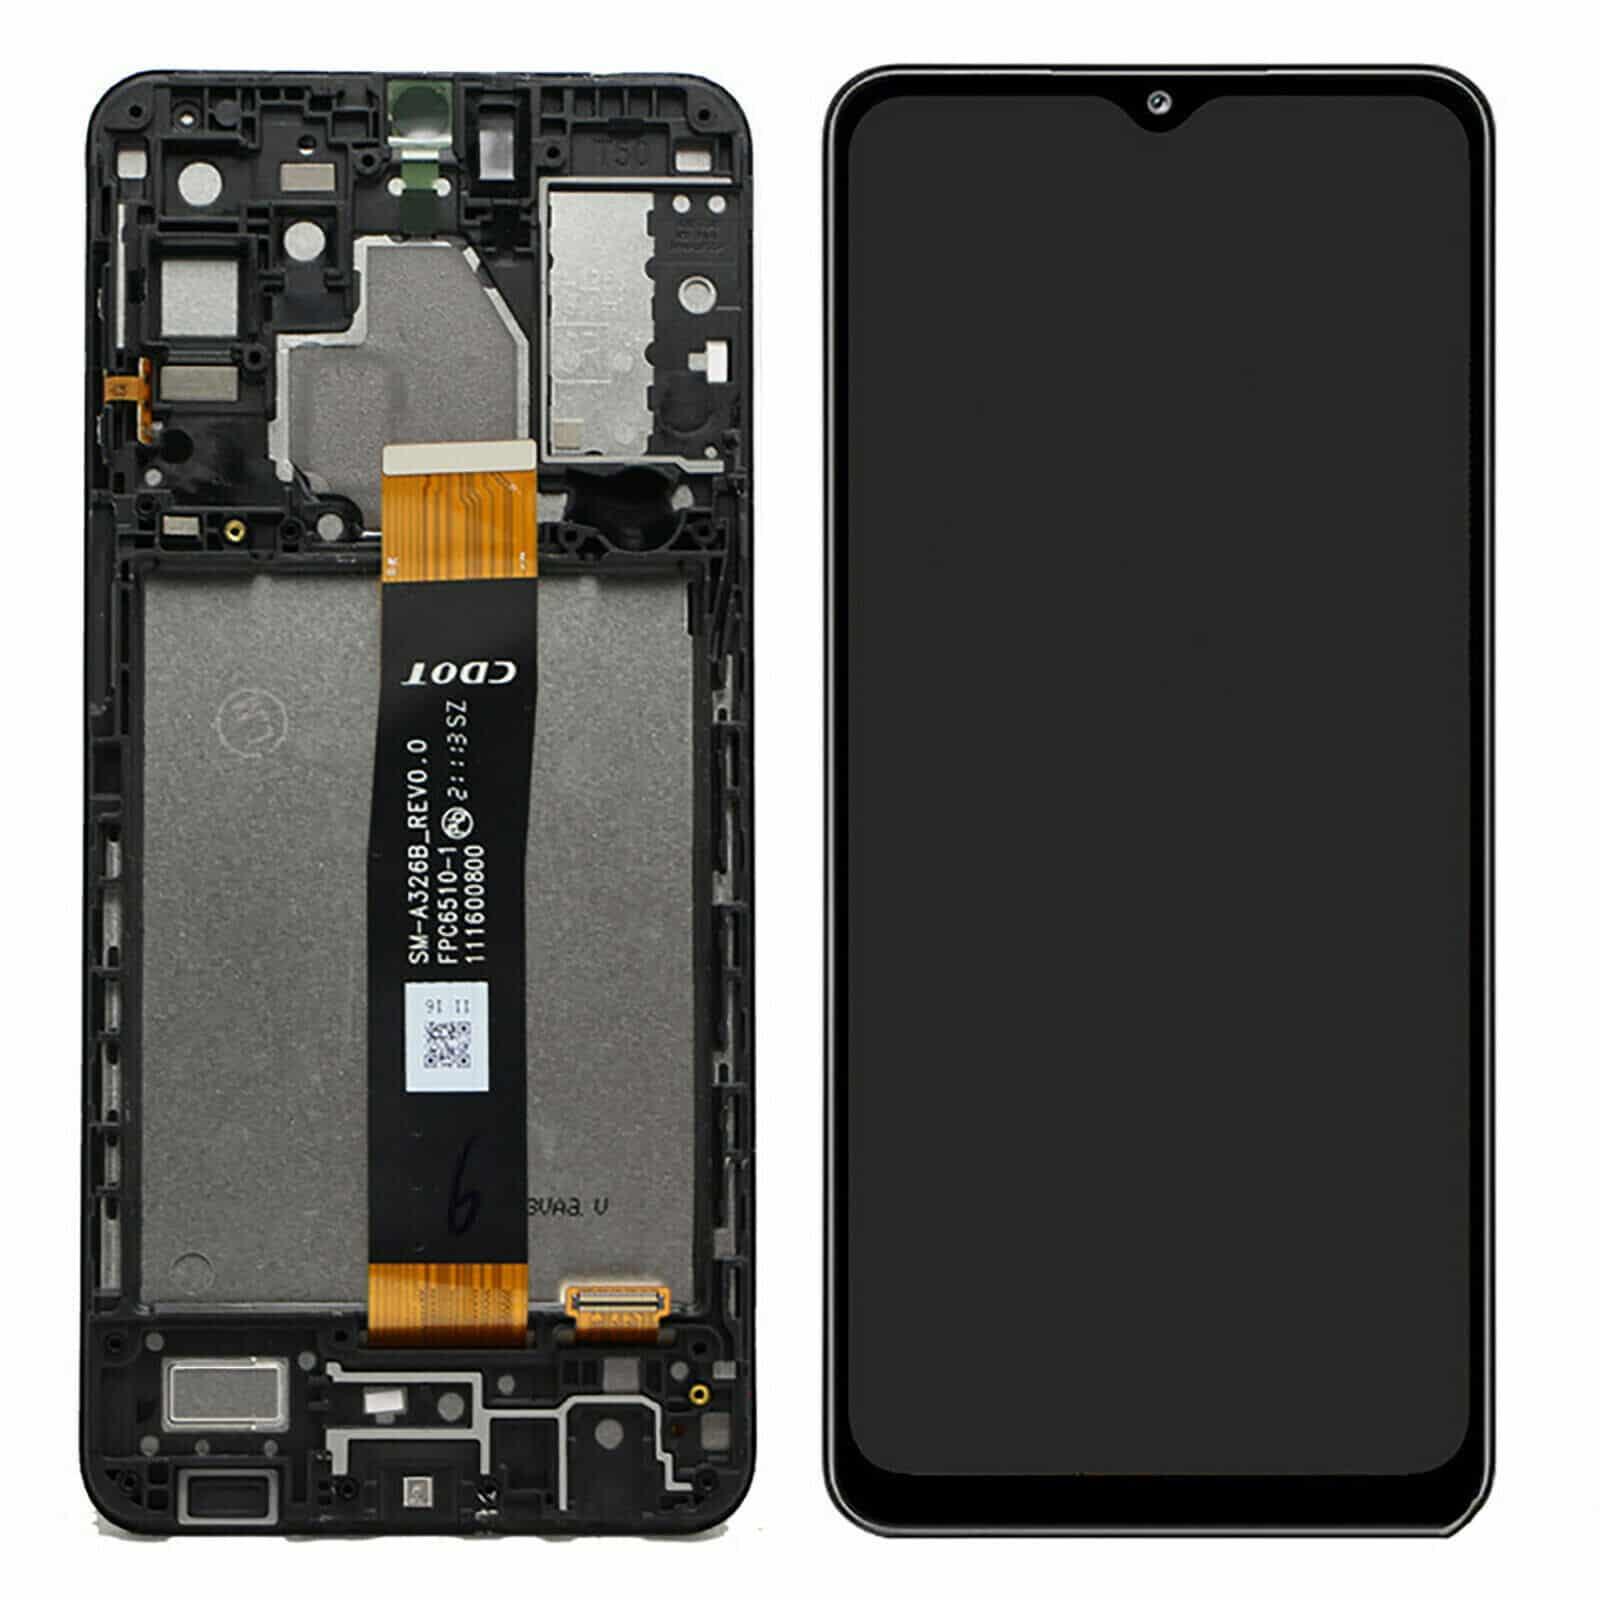 A32 5G Samsung – Galaxy A32 5G – MotherBoard – Main Flex Kabel